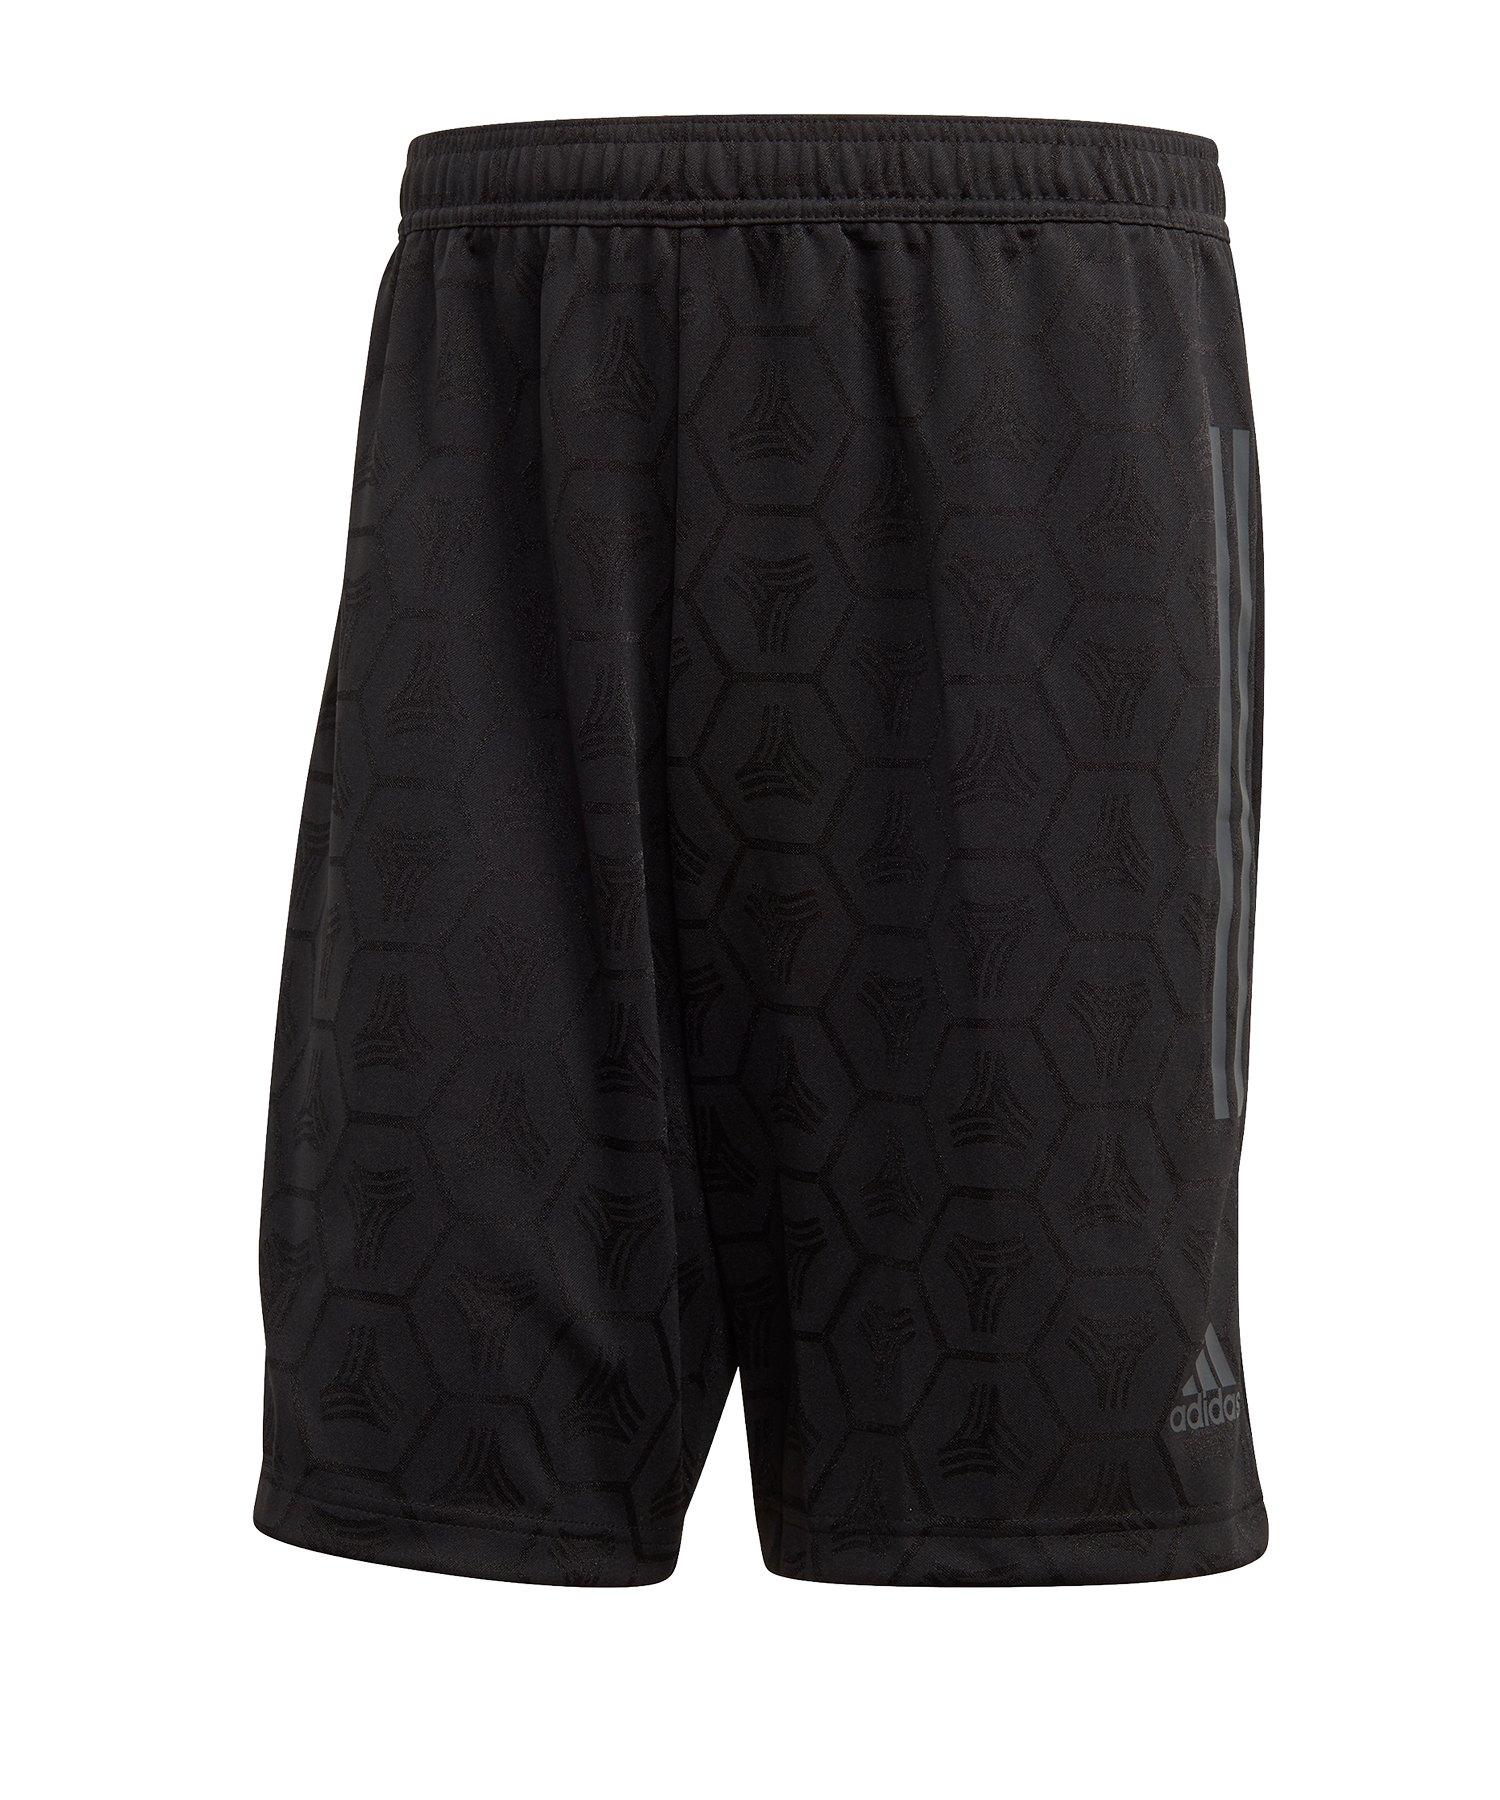 adidas Tango JQD Short Schwarz - schwarz